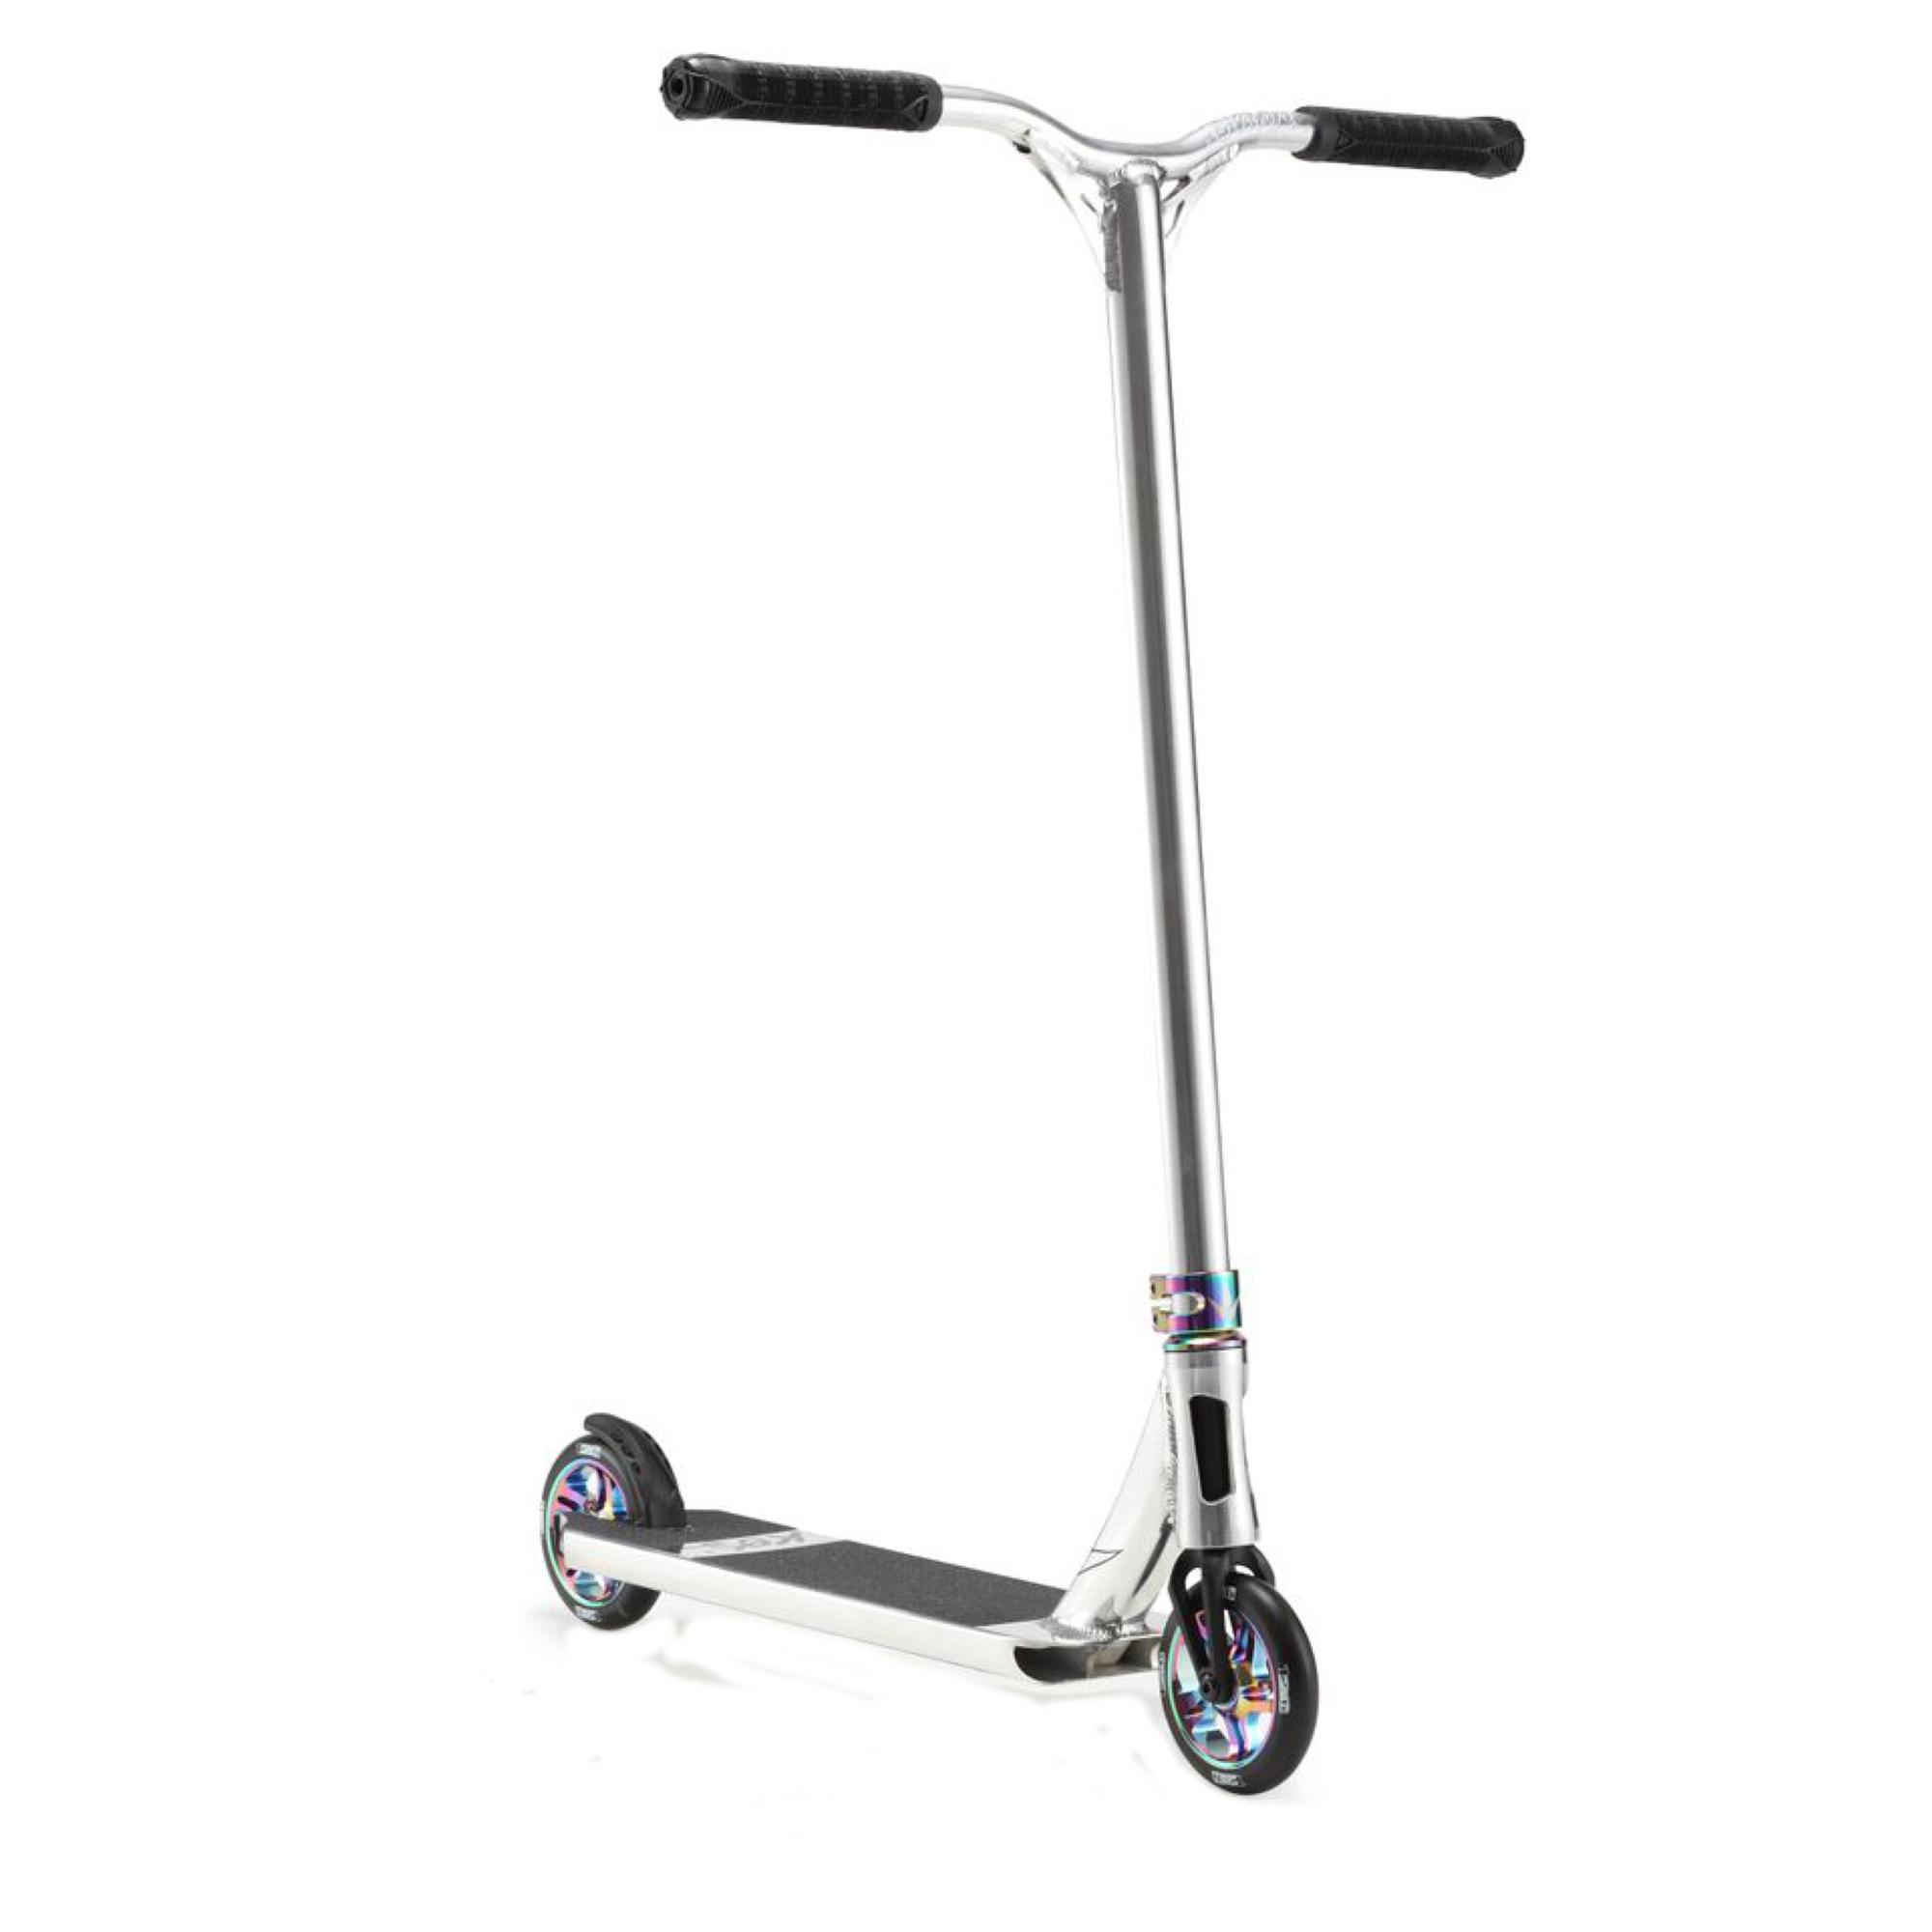 blunt-complete-scooter-king-of-spades-heist.jpg